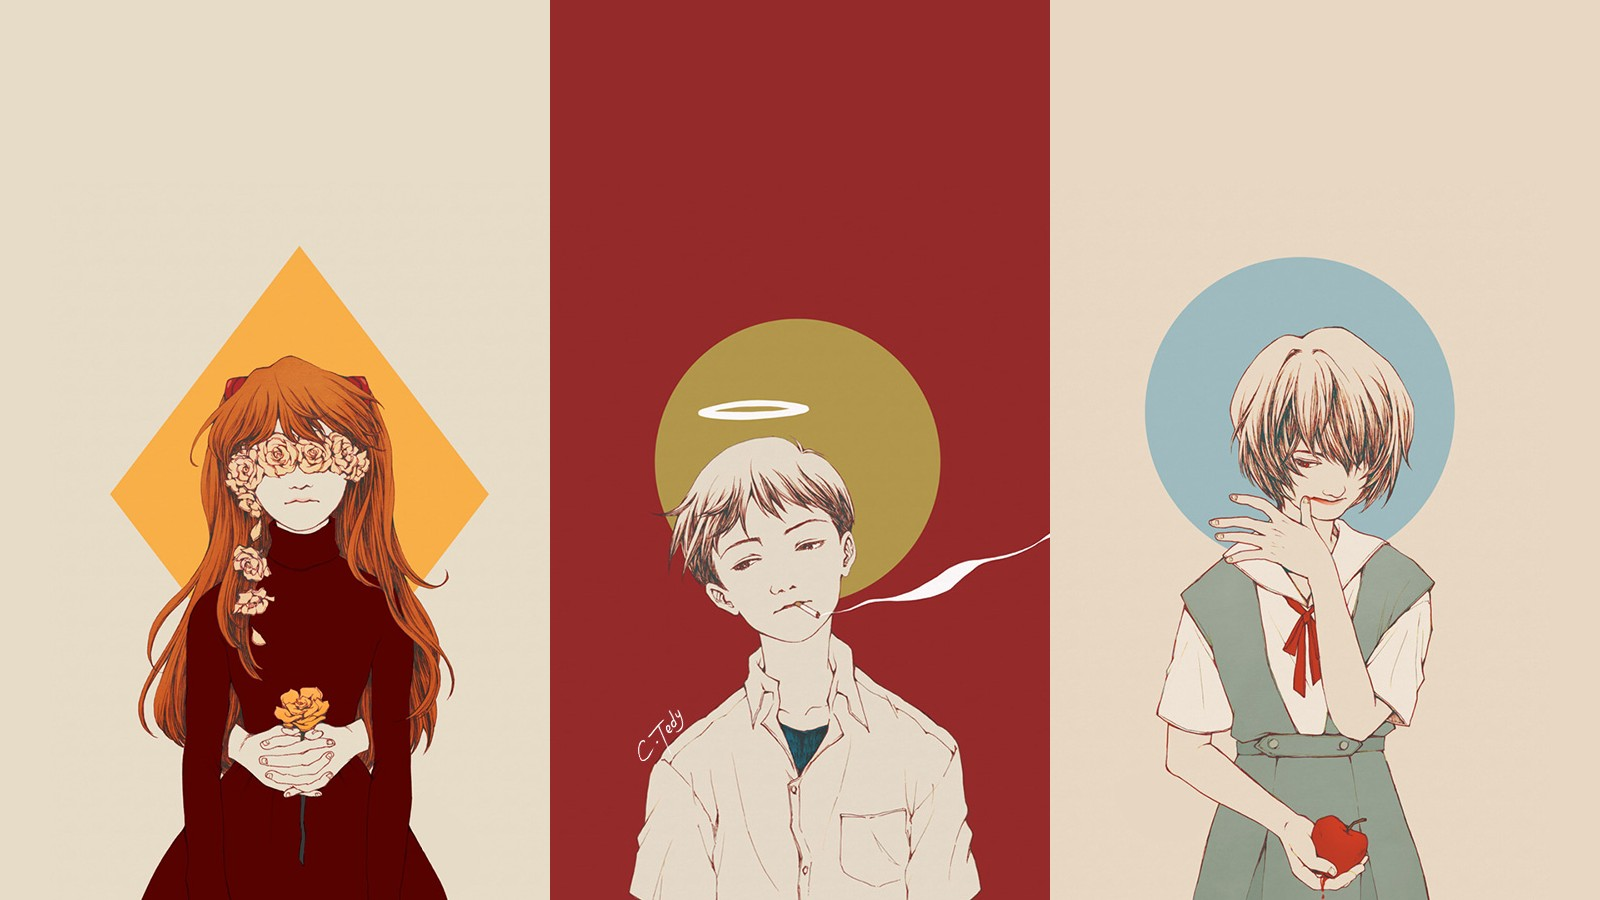 Neon Genesis Evangelion Asuka Langley Soryu Ayanami - Asuka Shinji Rei Art , HD Wallpaper & Backgrounds